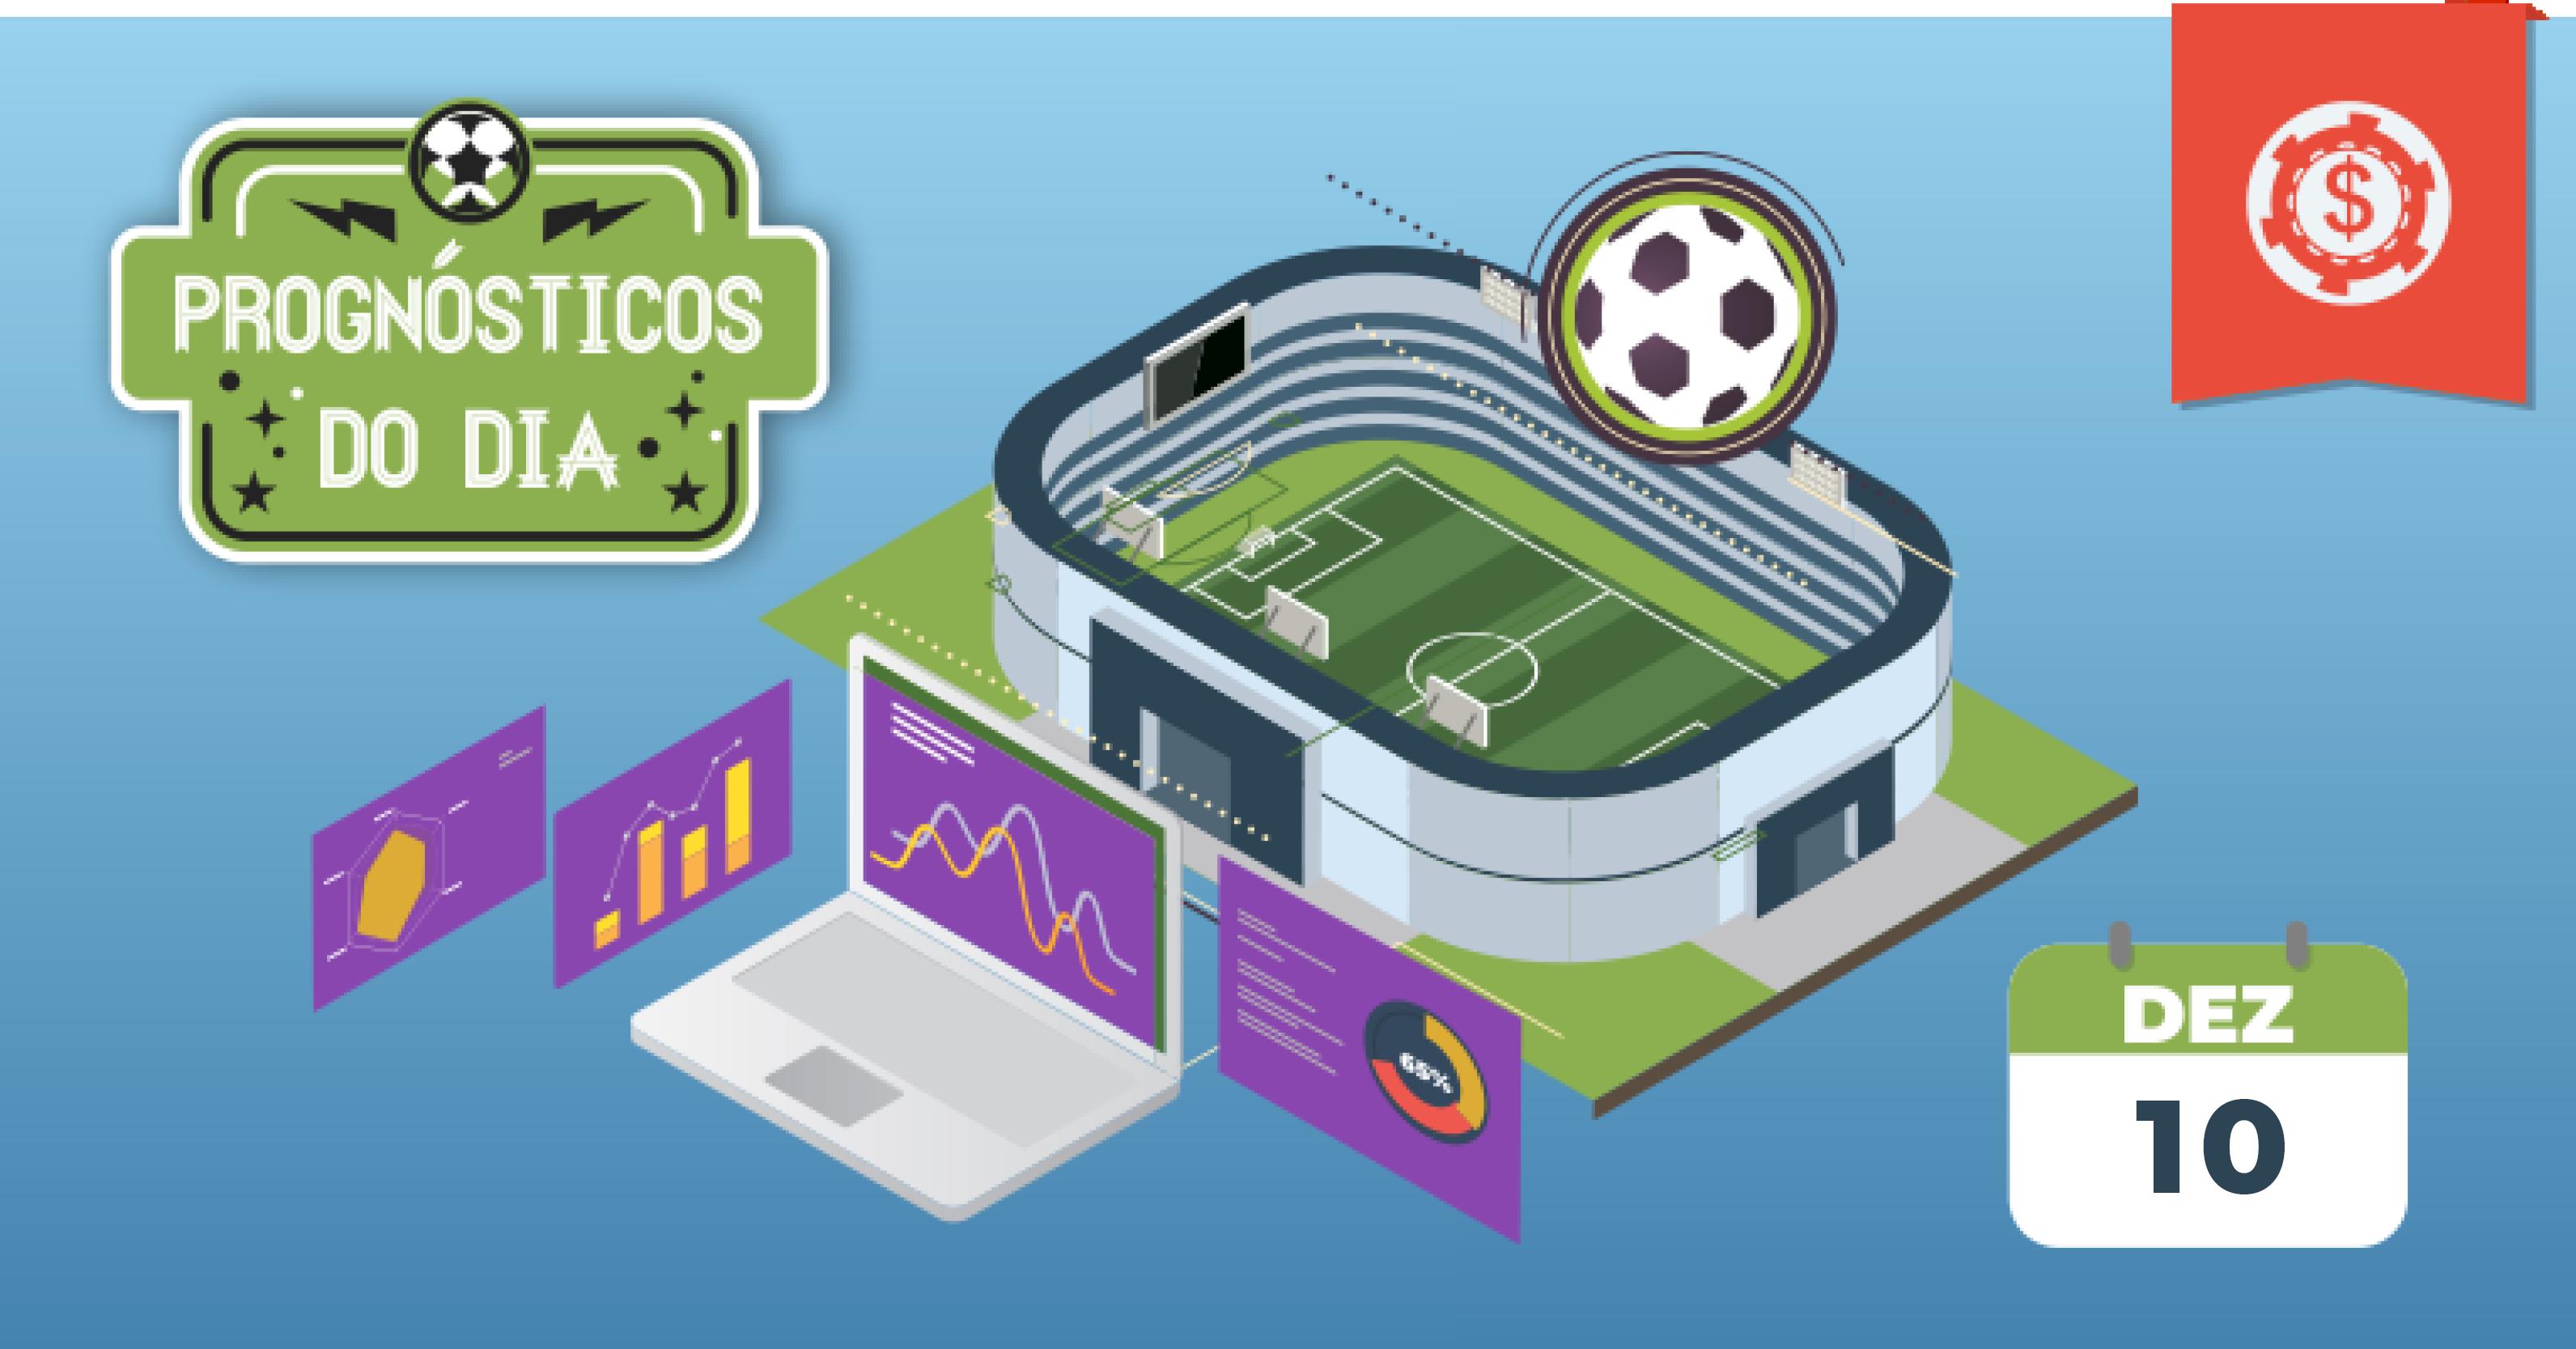 palpites-futebol-hoje-prognosticos-10-dezembro-2019